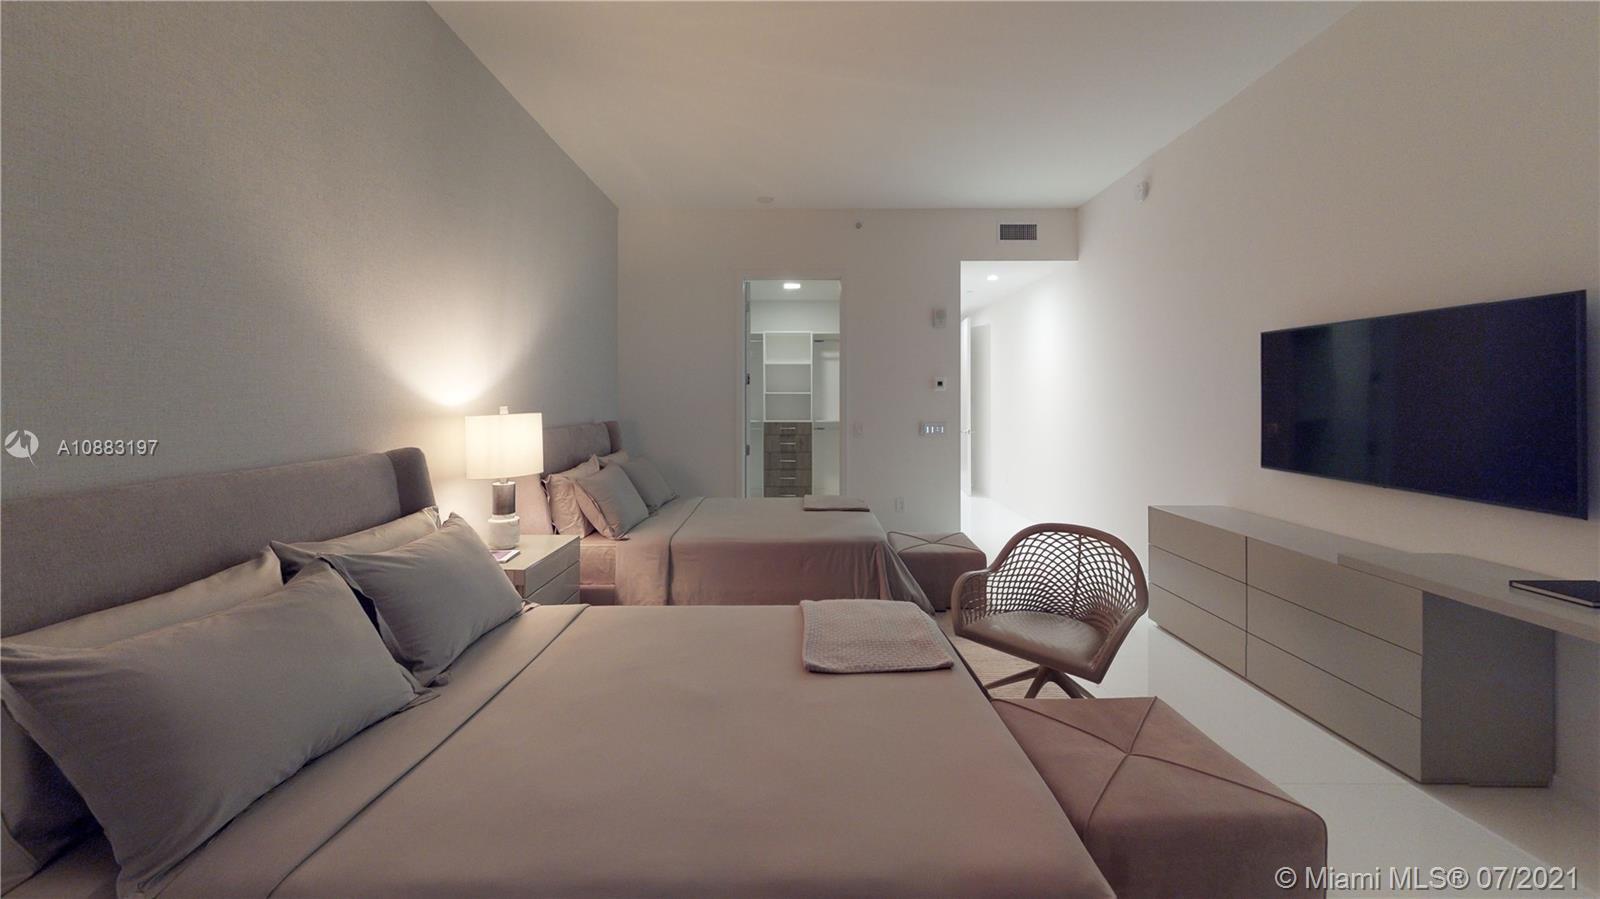 FENDI Chateau Residences, 9349 Collins Ave Unit 506, Surfside, Florida 33154, image 37